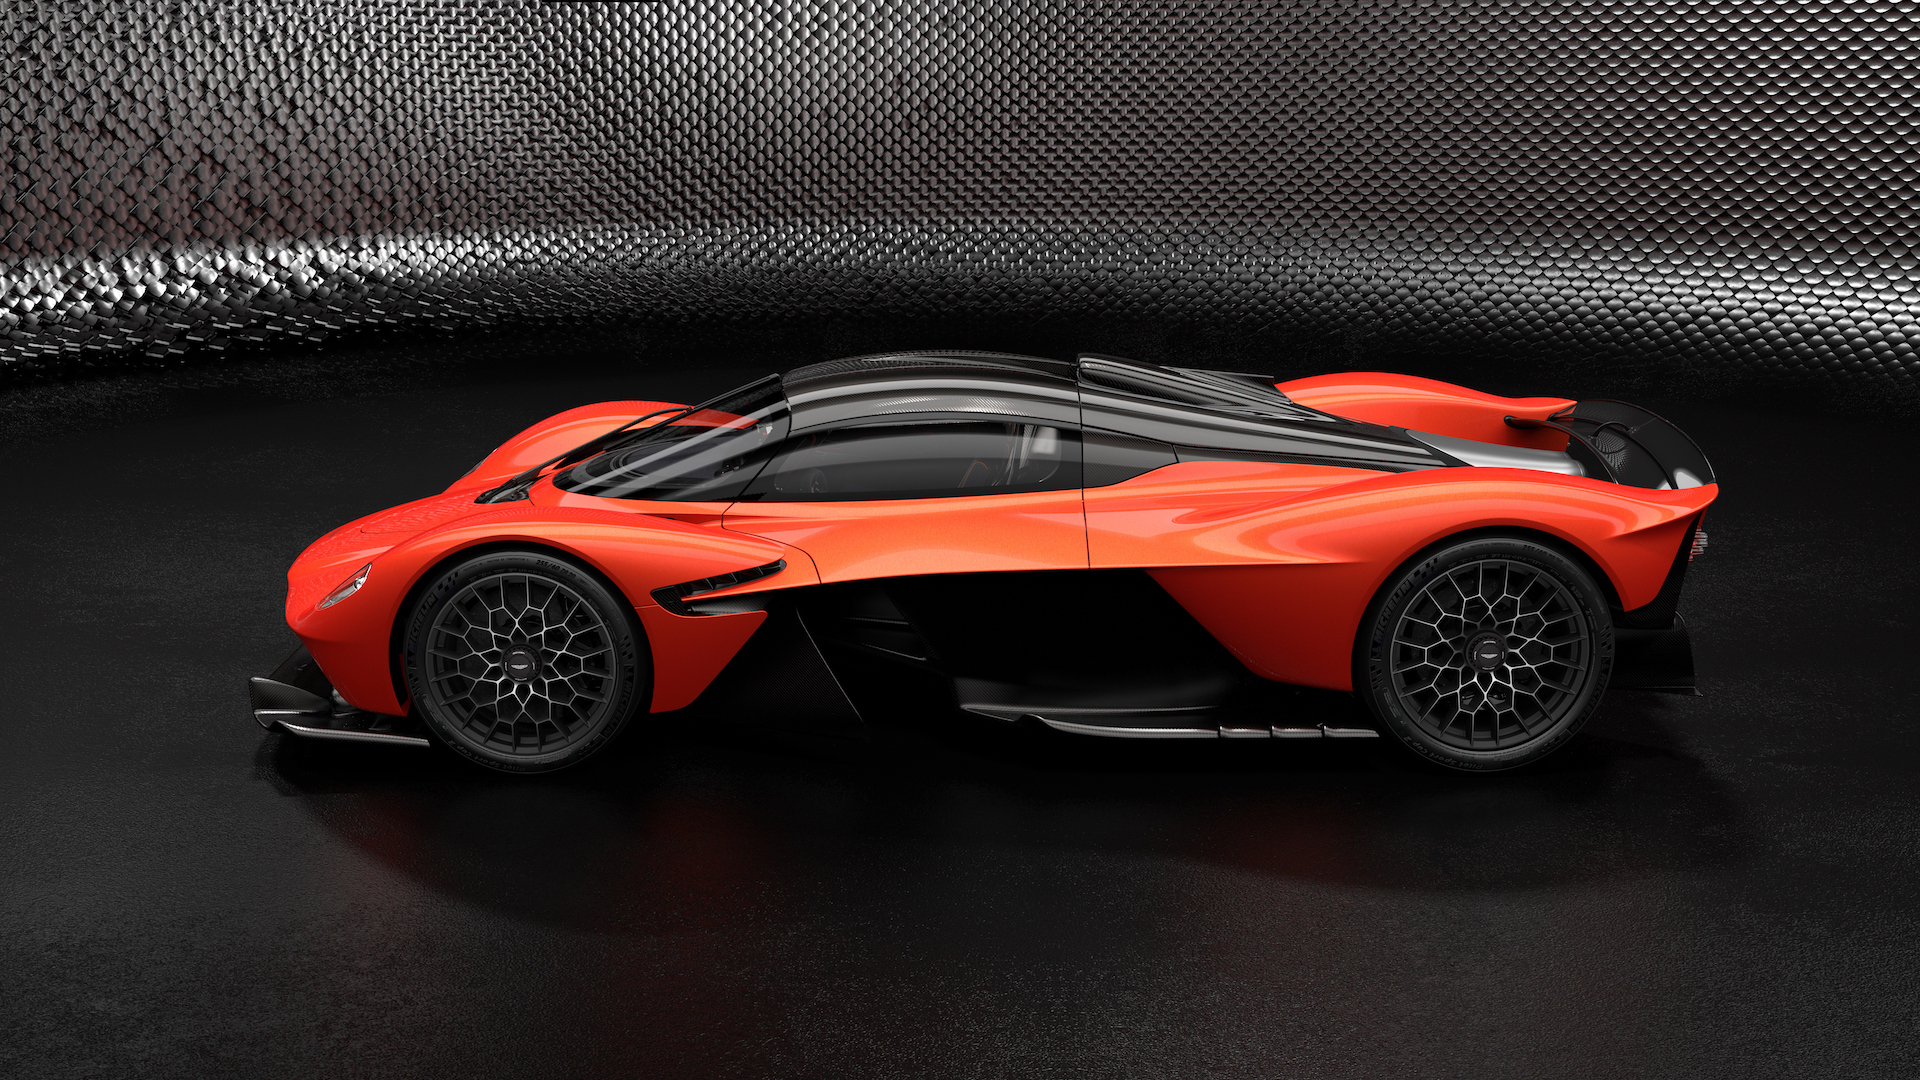 Aston Martin Valkyrie Will Attempt Nurburgring Lap Record